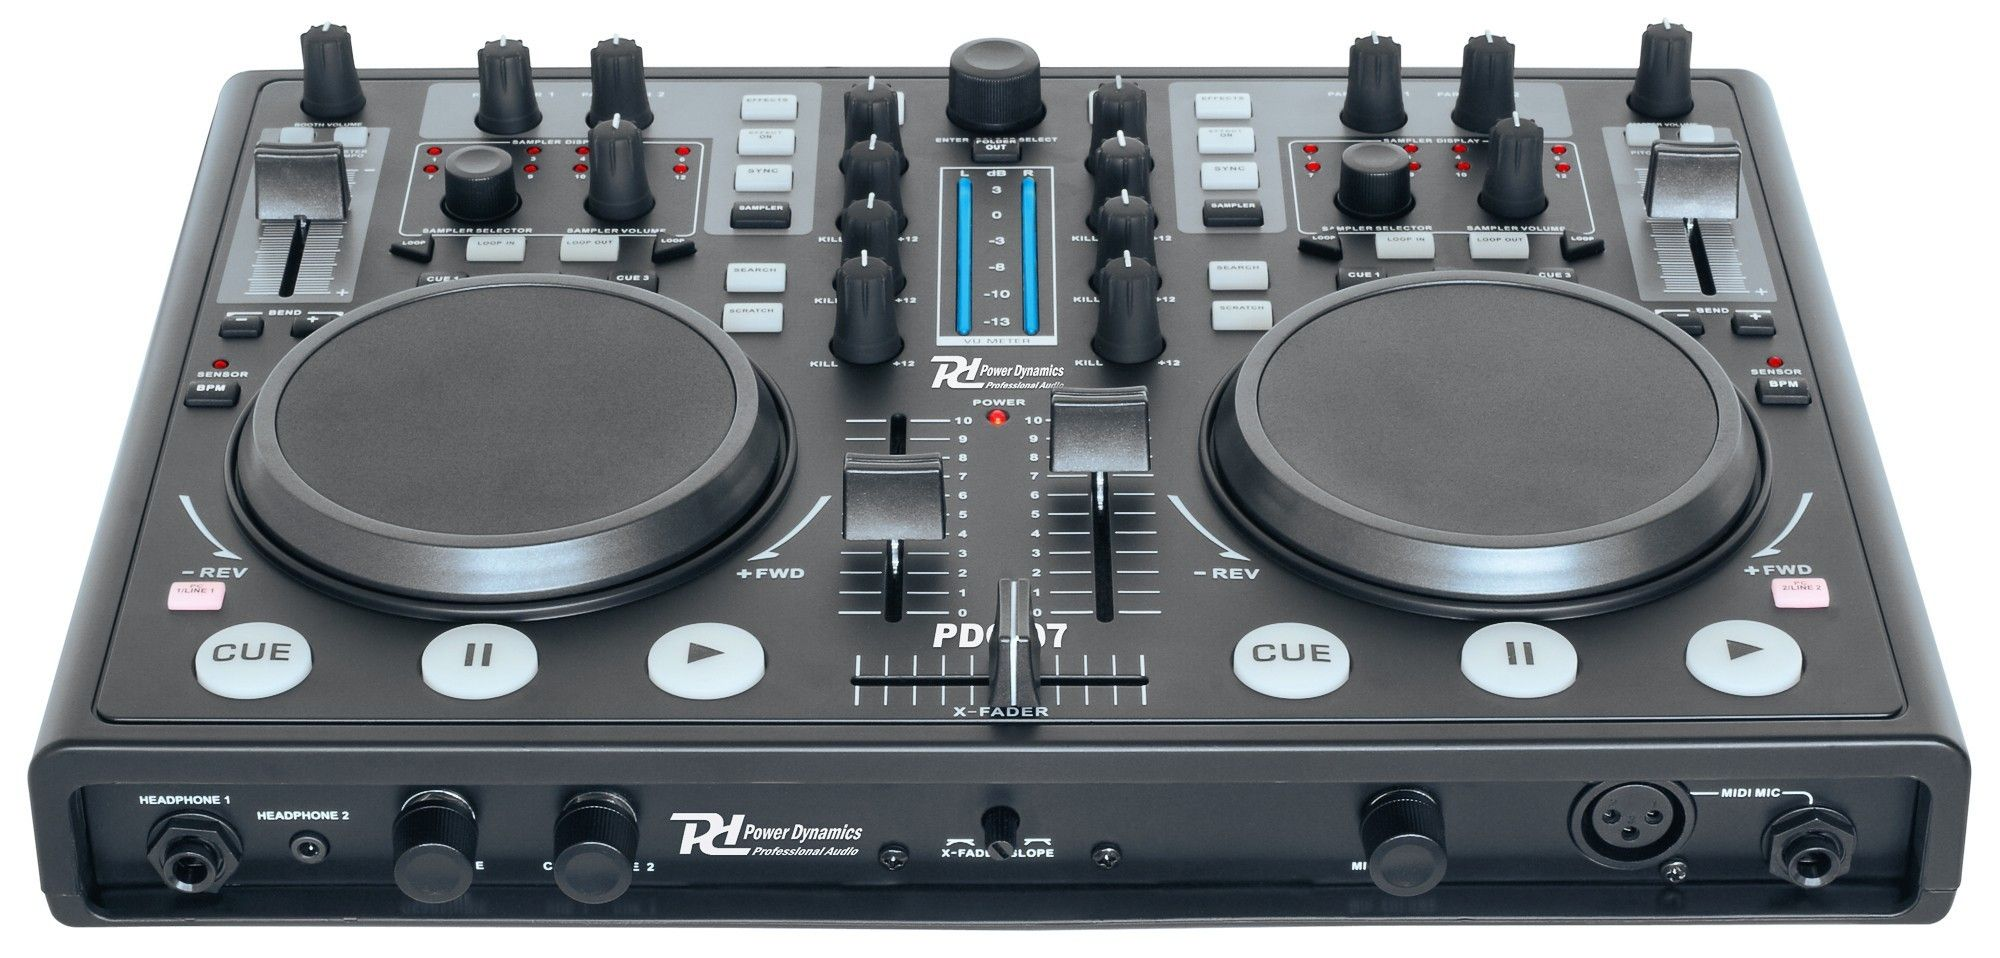 B-Stock - Power Dynamics PDC-07 DJ MIDI controller met geluidskaart & Virtual DJ Software